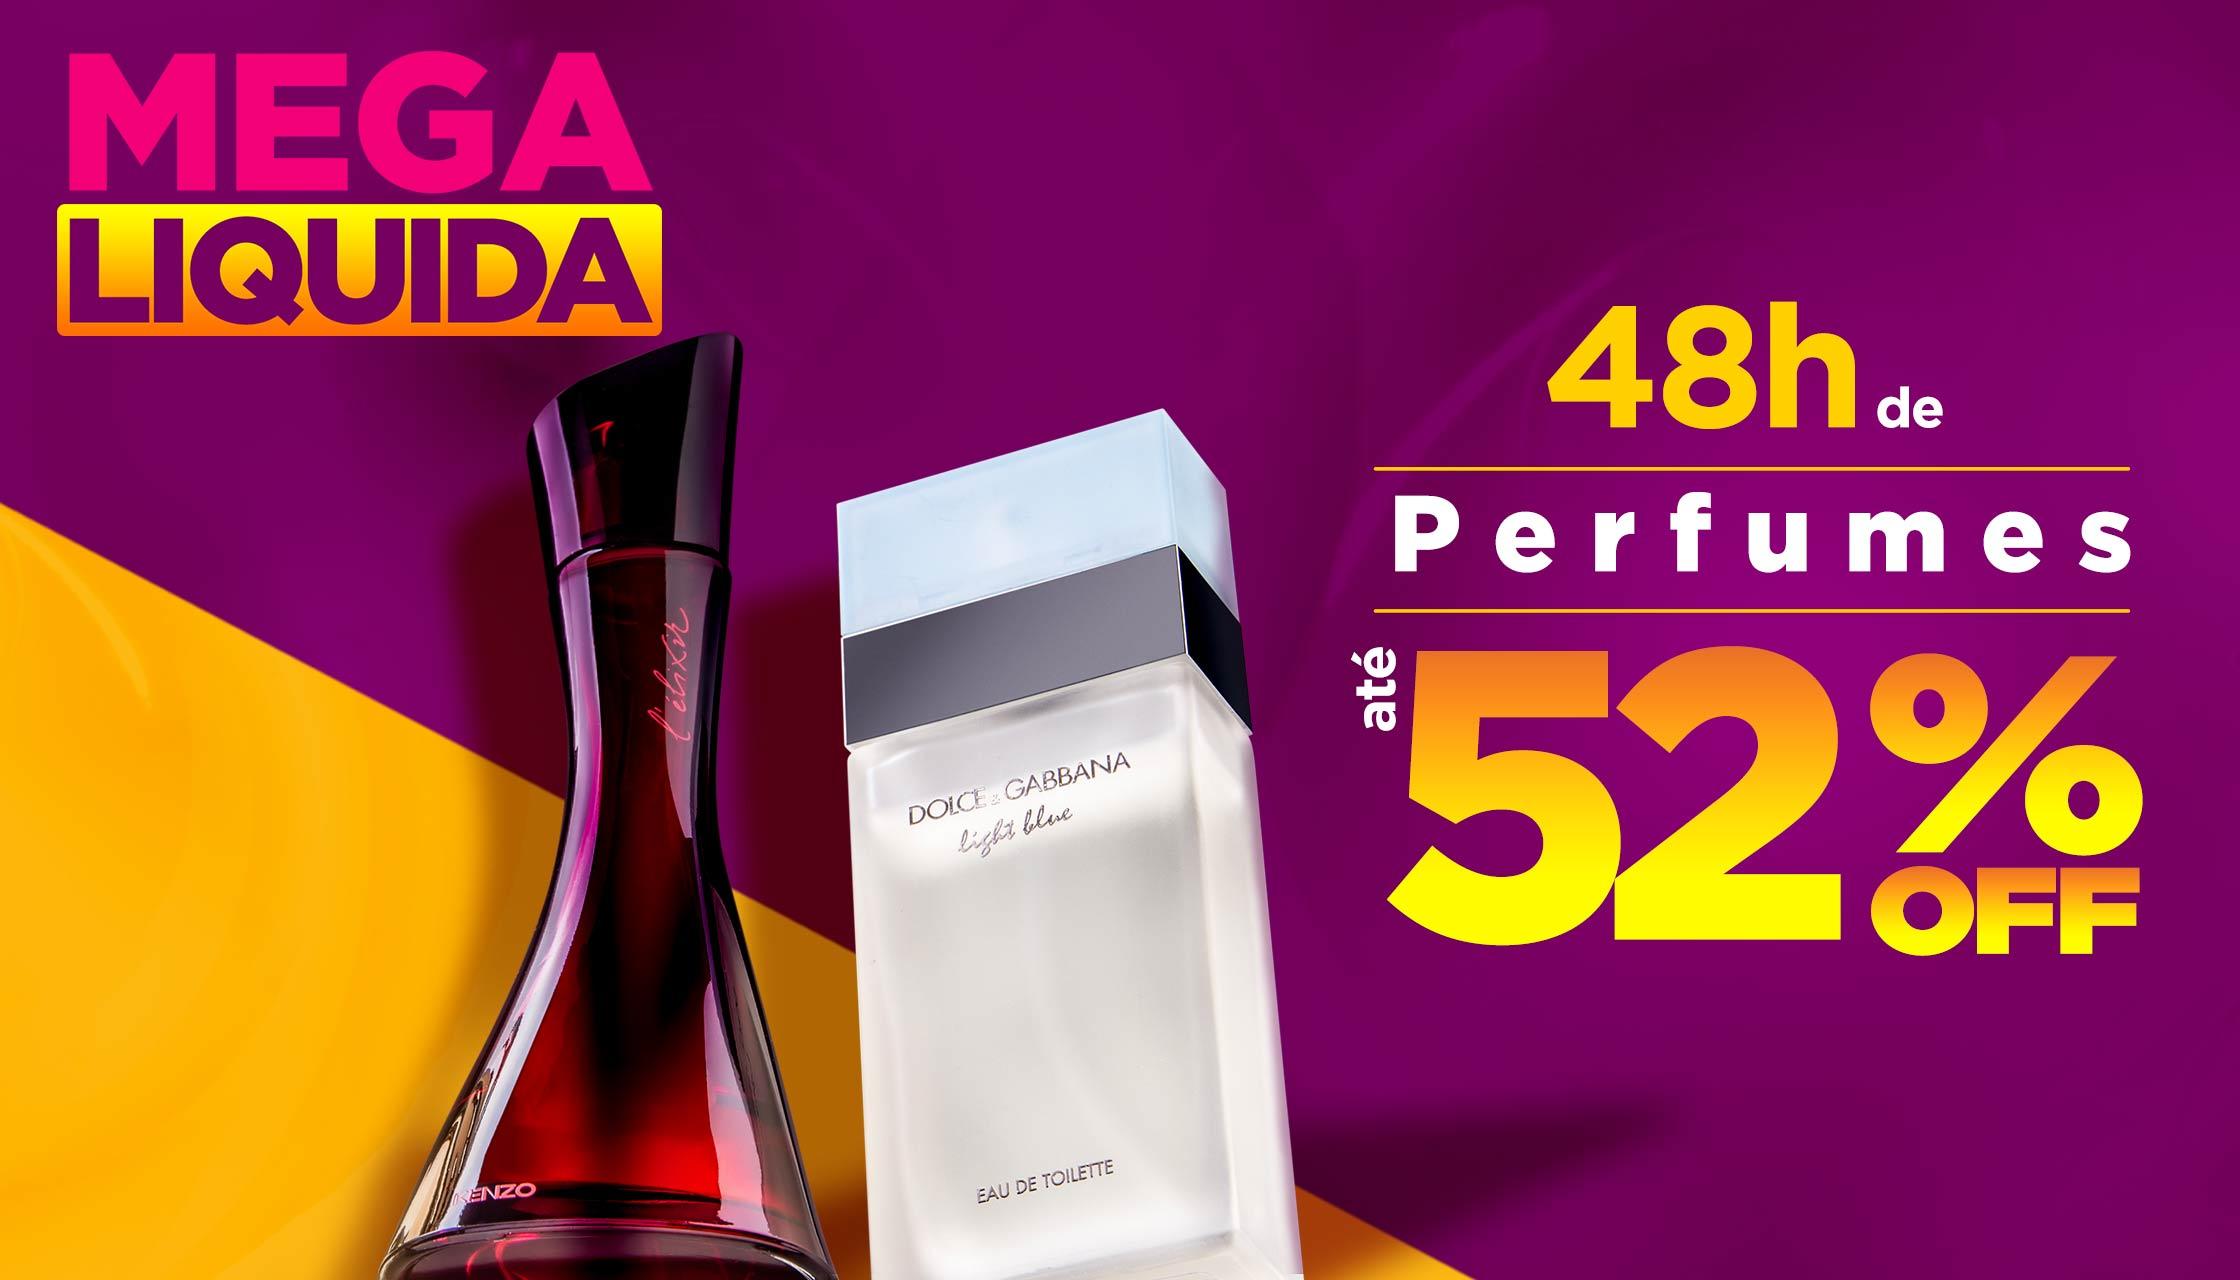 55755db4505c3 Perfumes Importados. Perfume Nacional e Importado